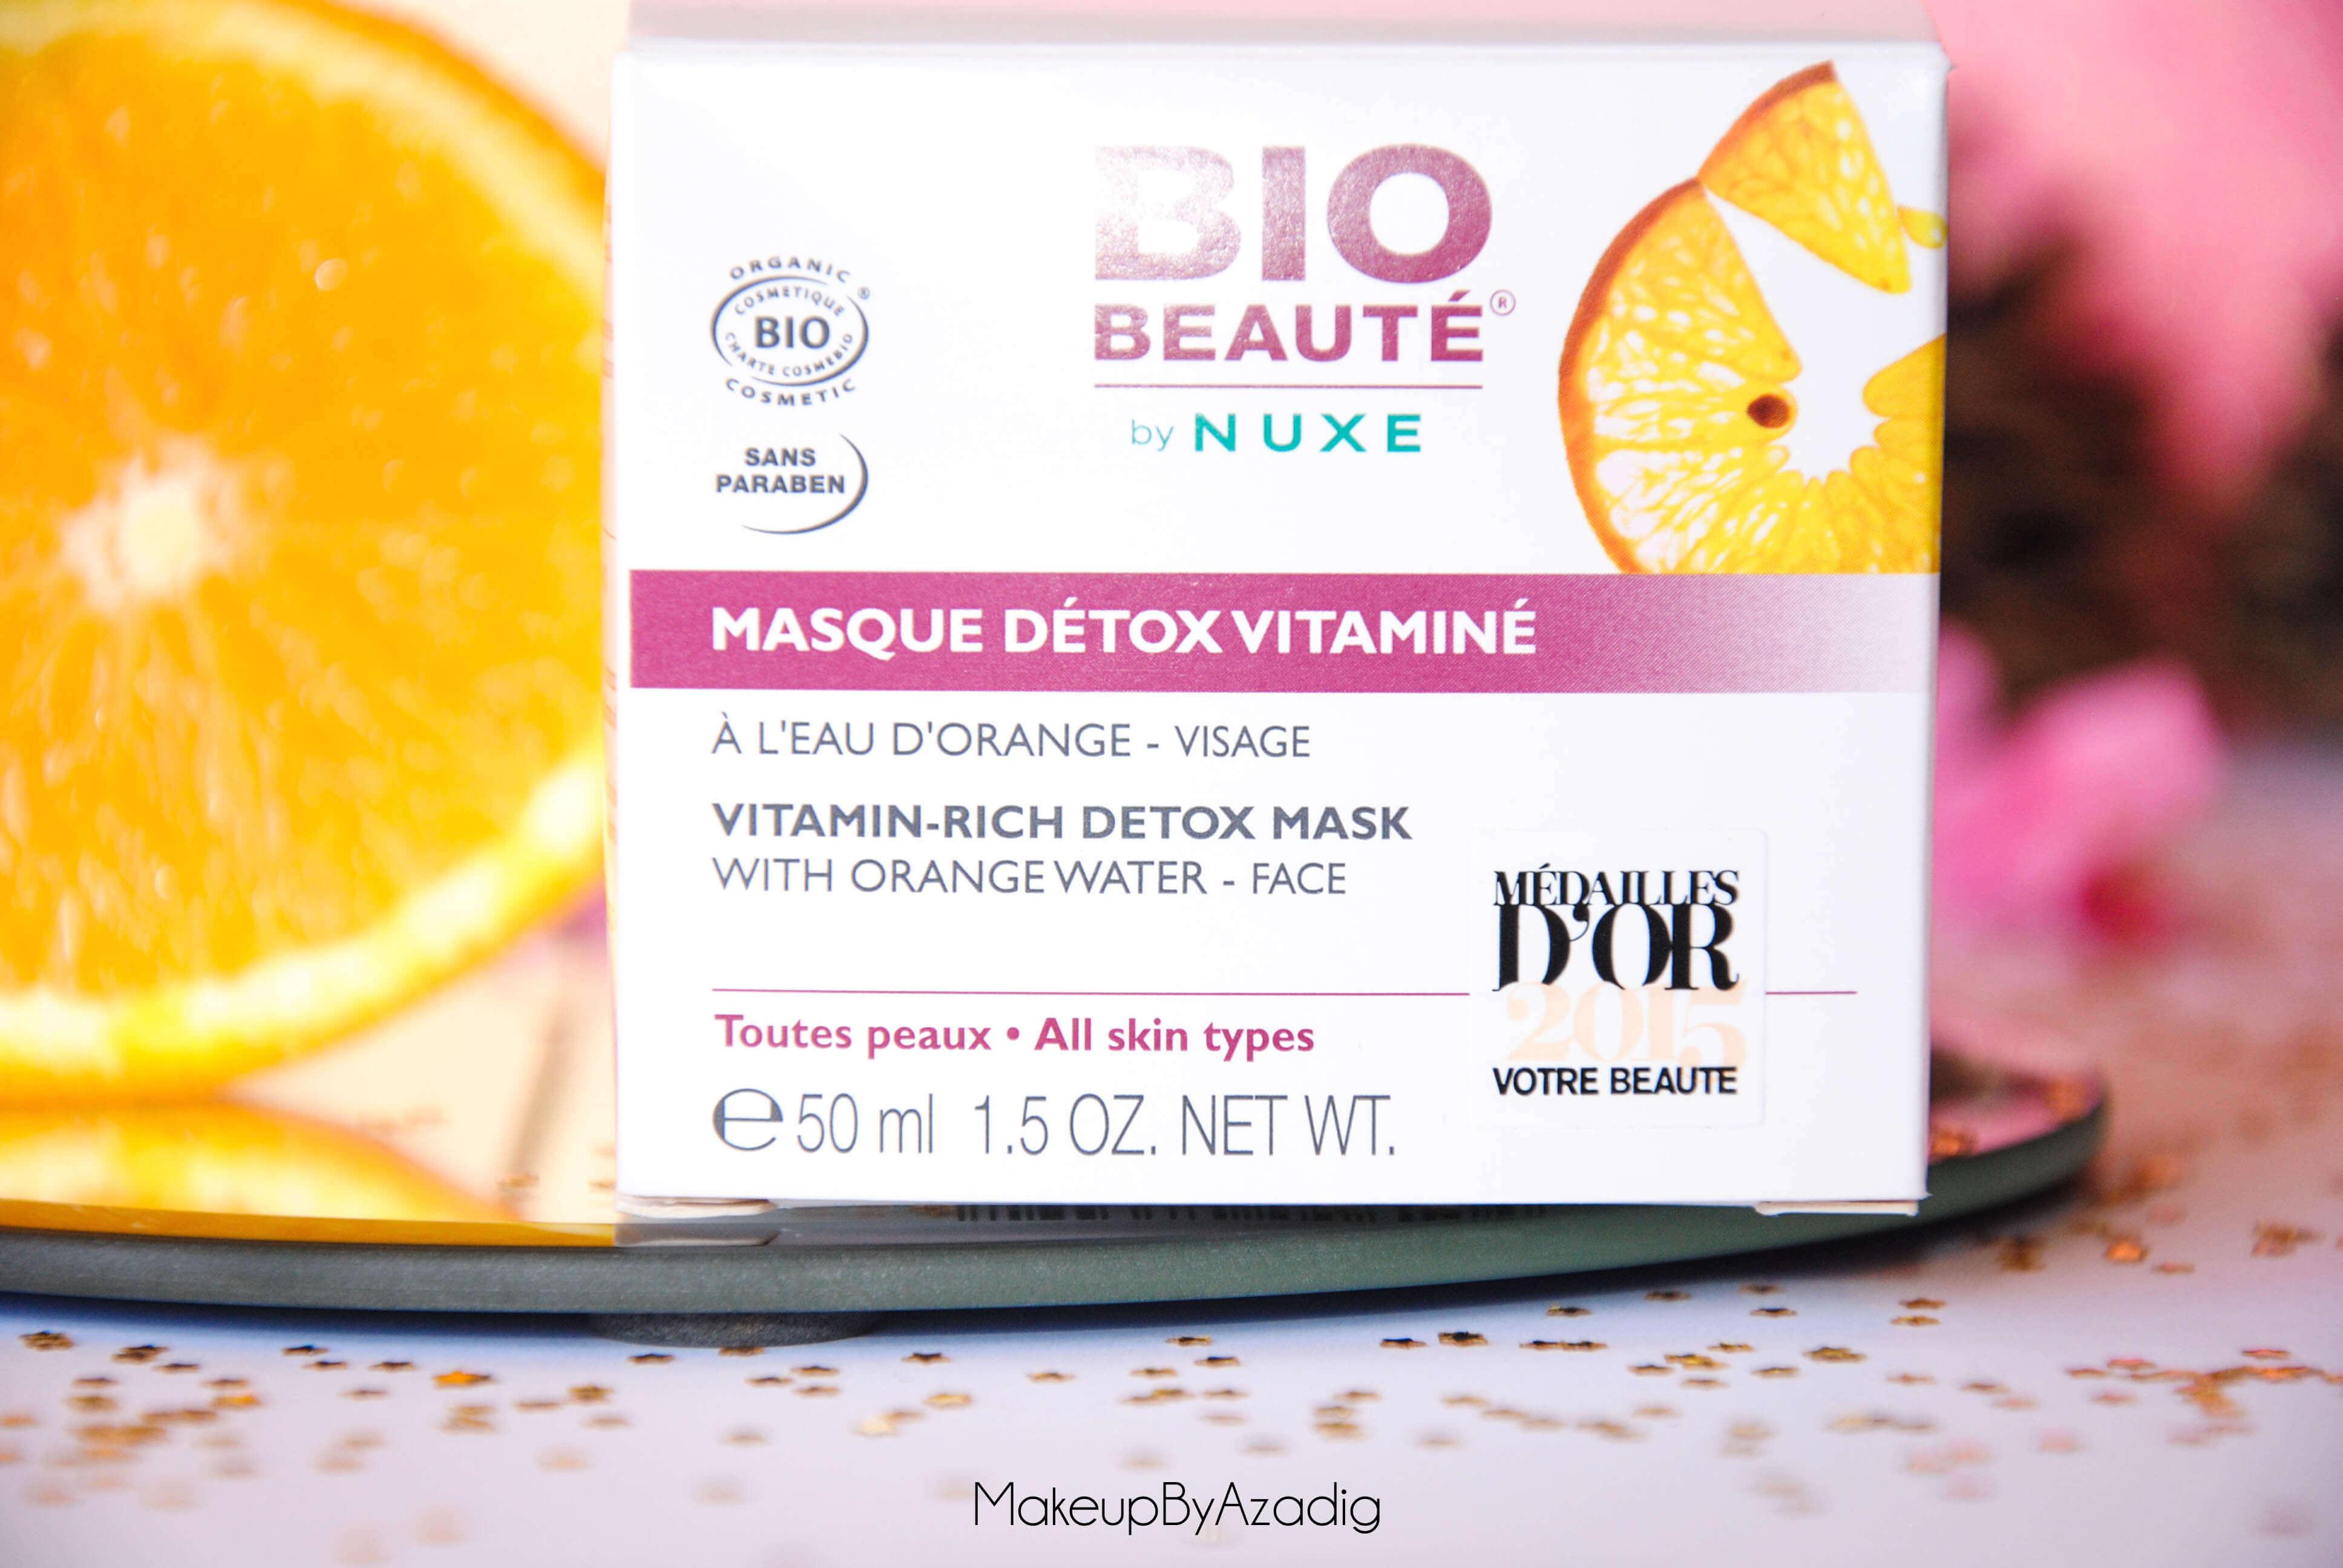 masque-detox-vitamine-bio-beaute-nuxe-makeupbyazadig-pas-cher-avis-revue-doctipharma-troyes-influencer